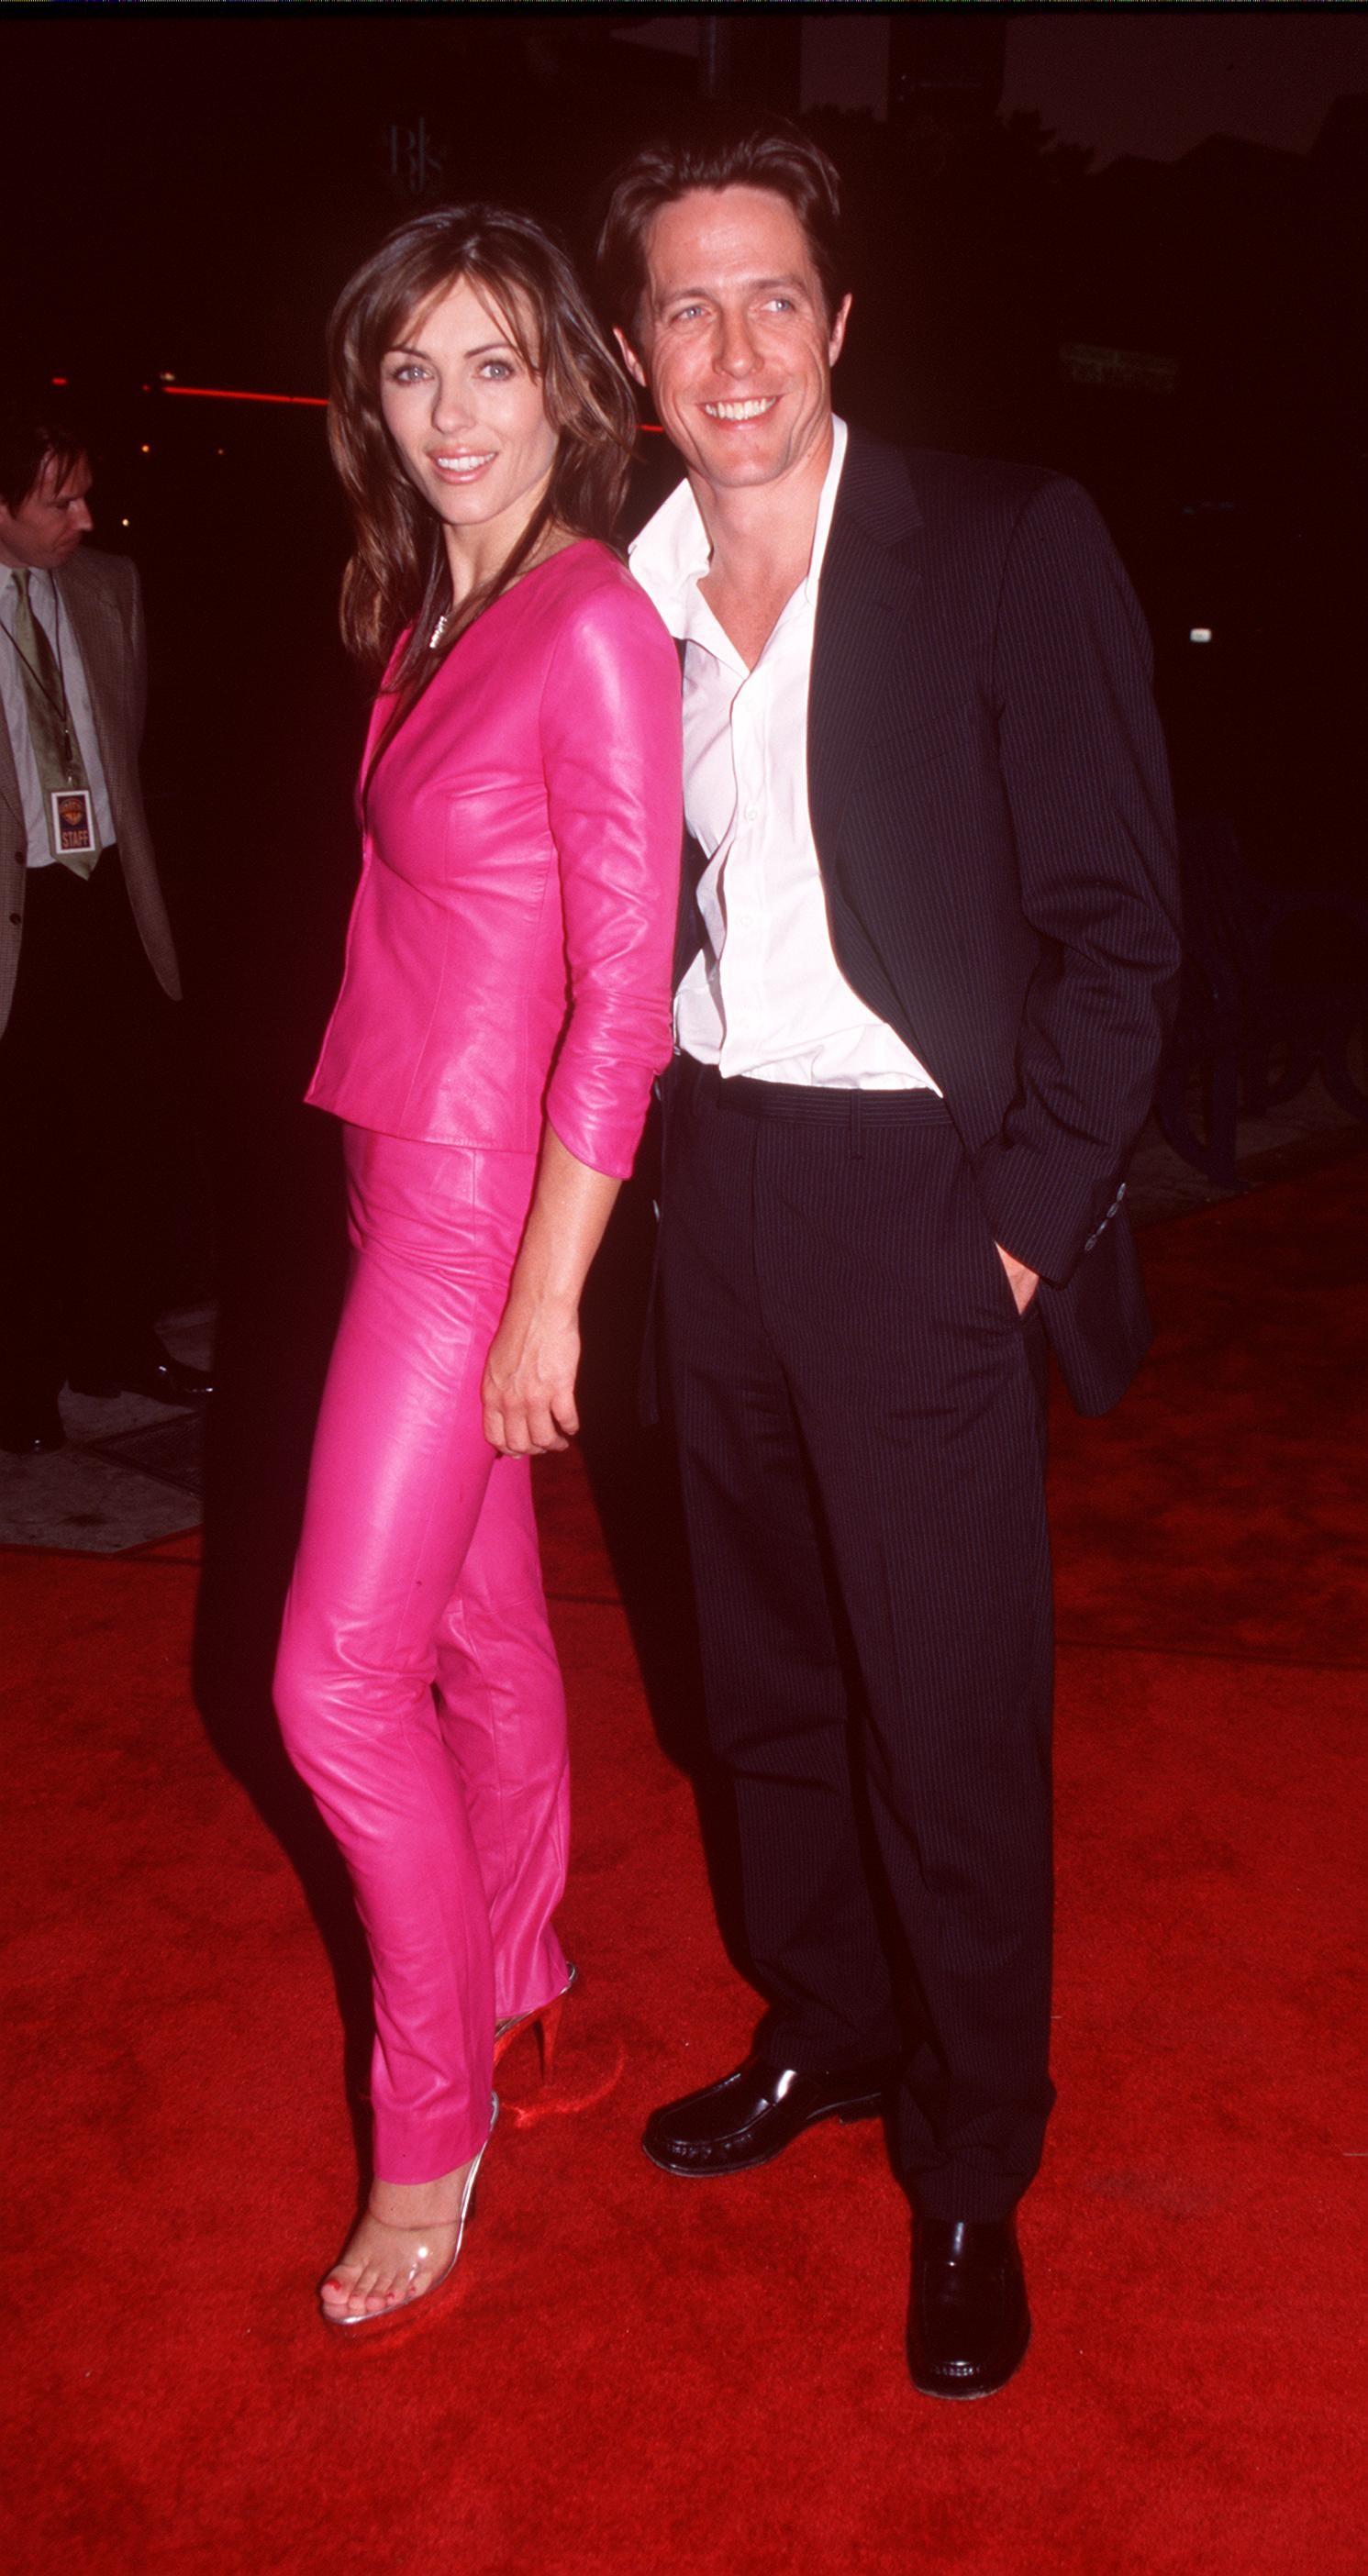 Elizabeth Hurley e Hugh Grant juntos, em 2000 (Foto: Getty Images)